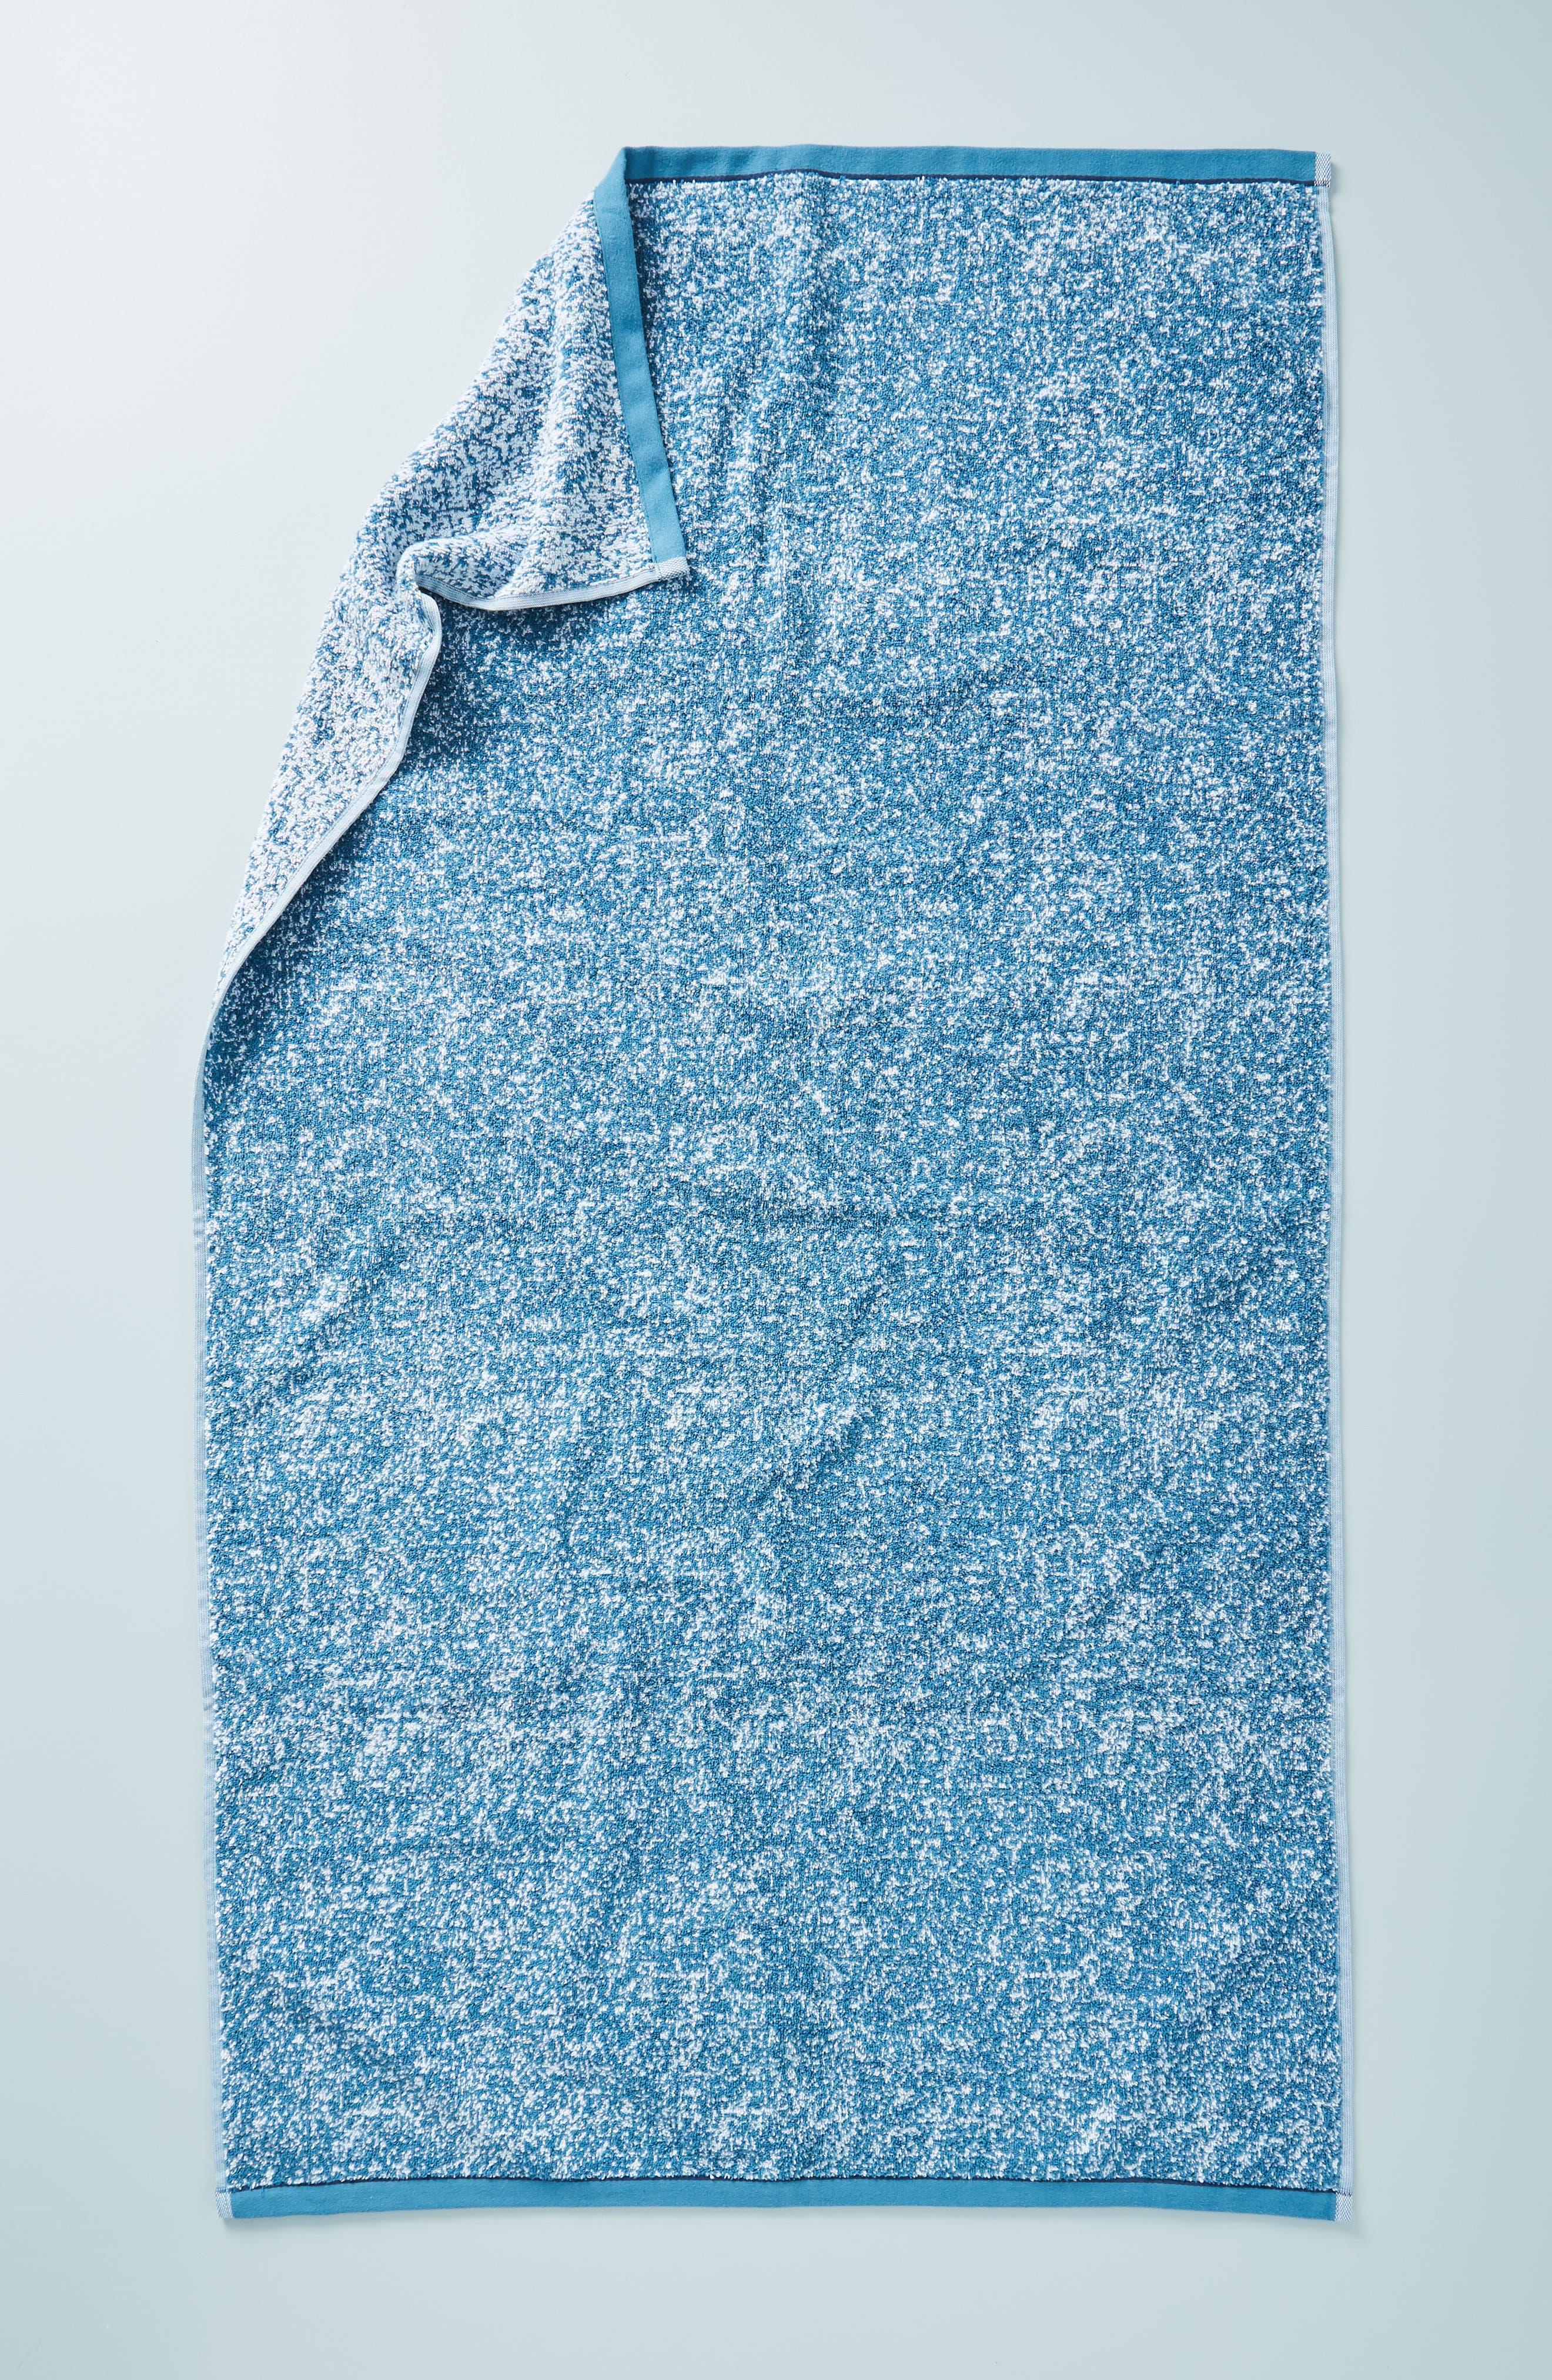 ANTHROPOLOGIE, Mairade Hand Towel, Main thumbnail 1, color, TEAL